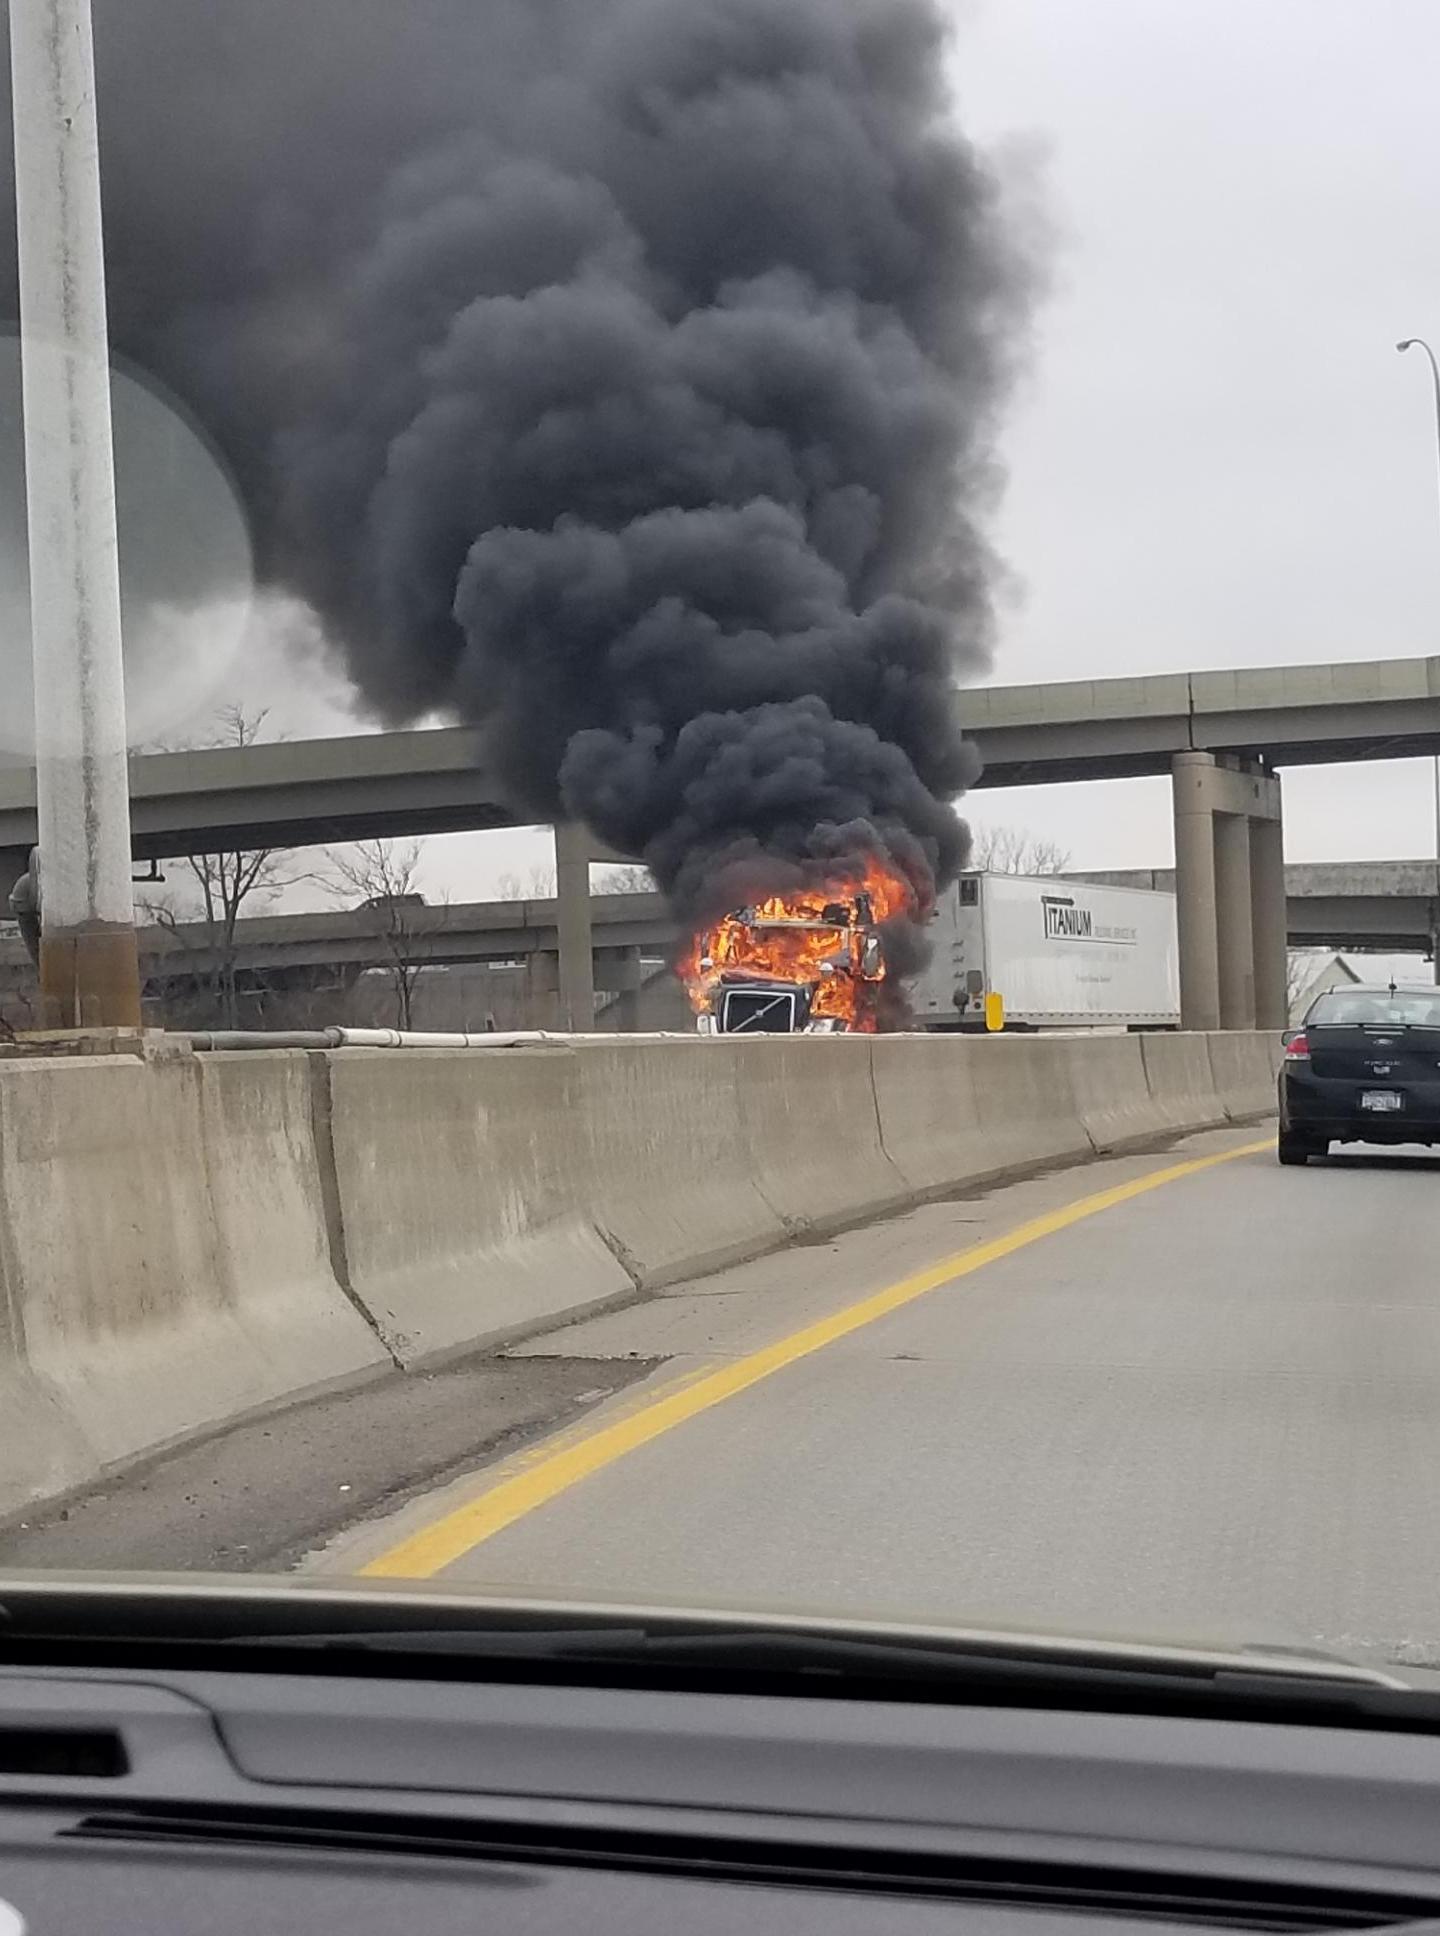 truck on fire_1522442676143.jpg.jpg